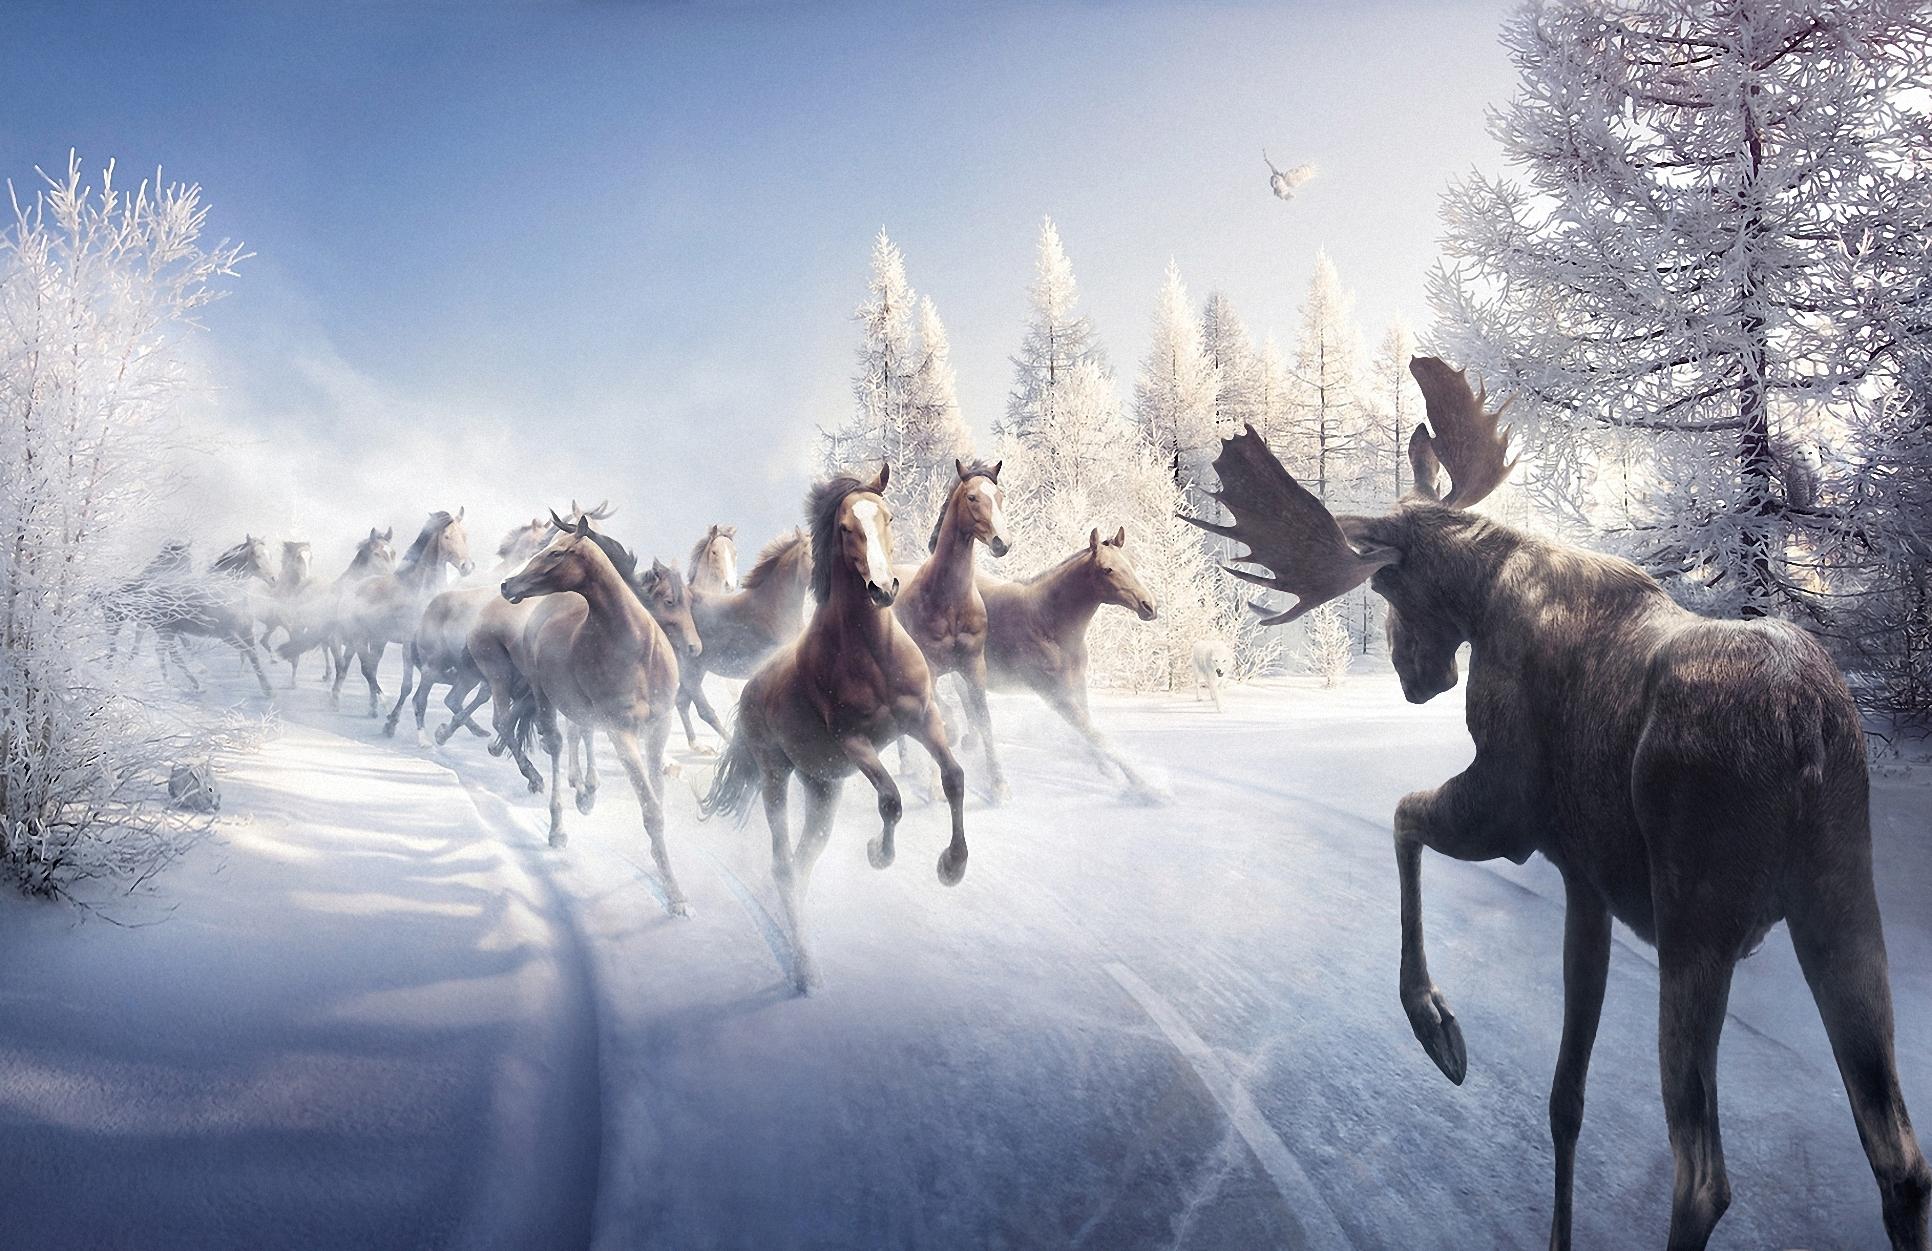 christmas sleigh horses 1920x1080 wallpaper - photo #24